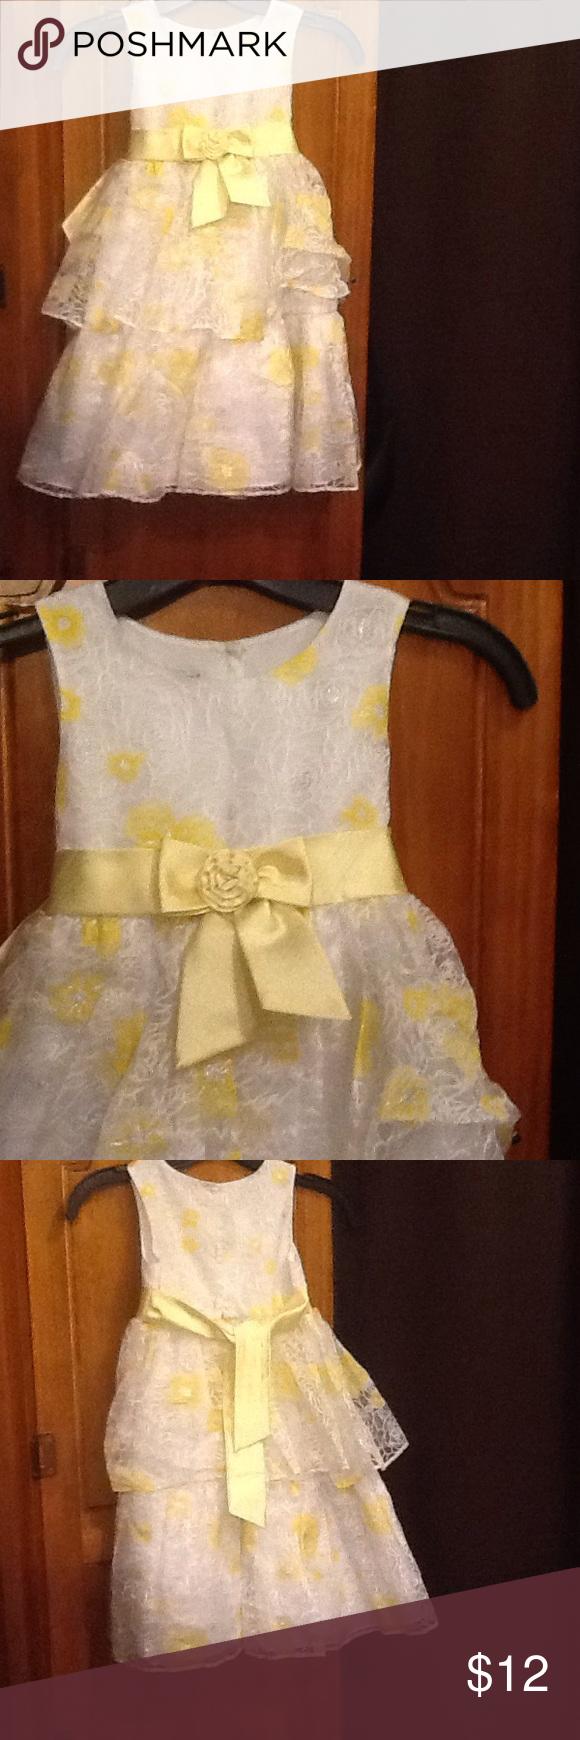 Toddler Dress Toddler Dress Casual White Dress Dresses [ 1740 x 580 Pixel ]